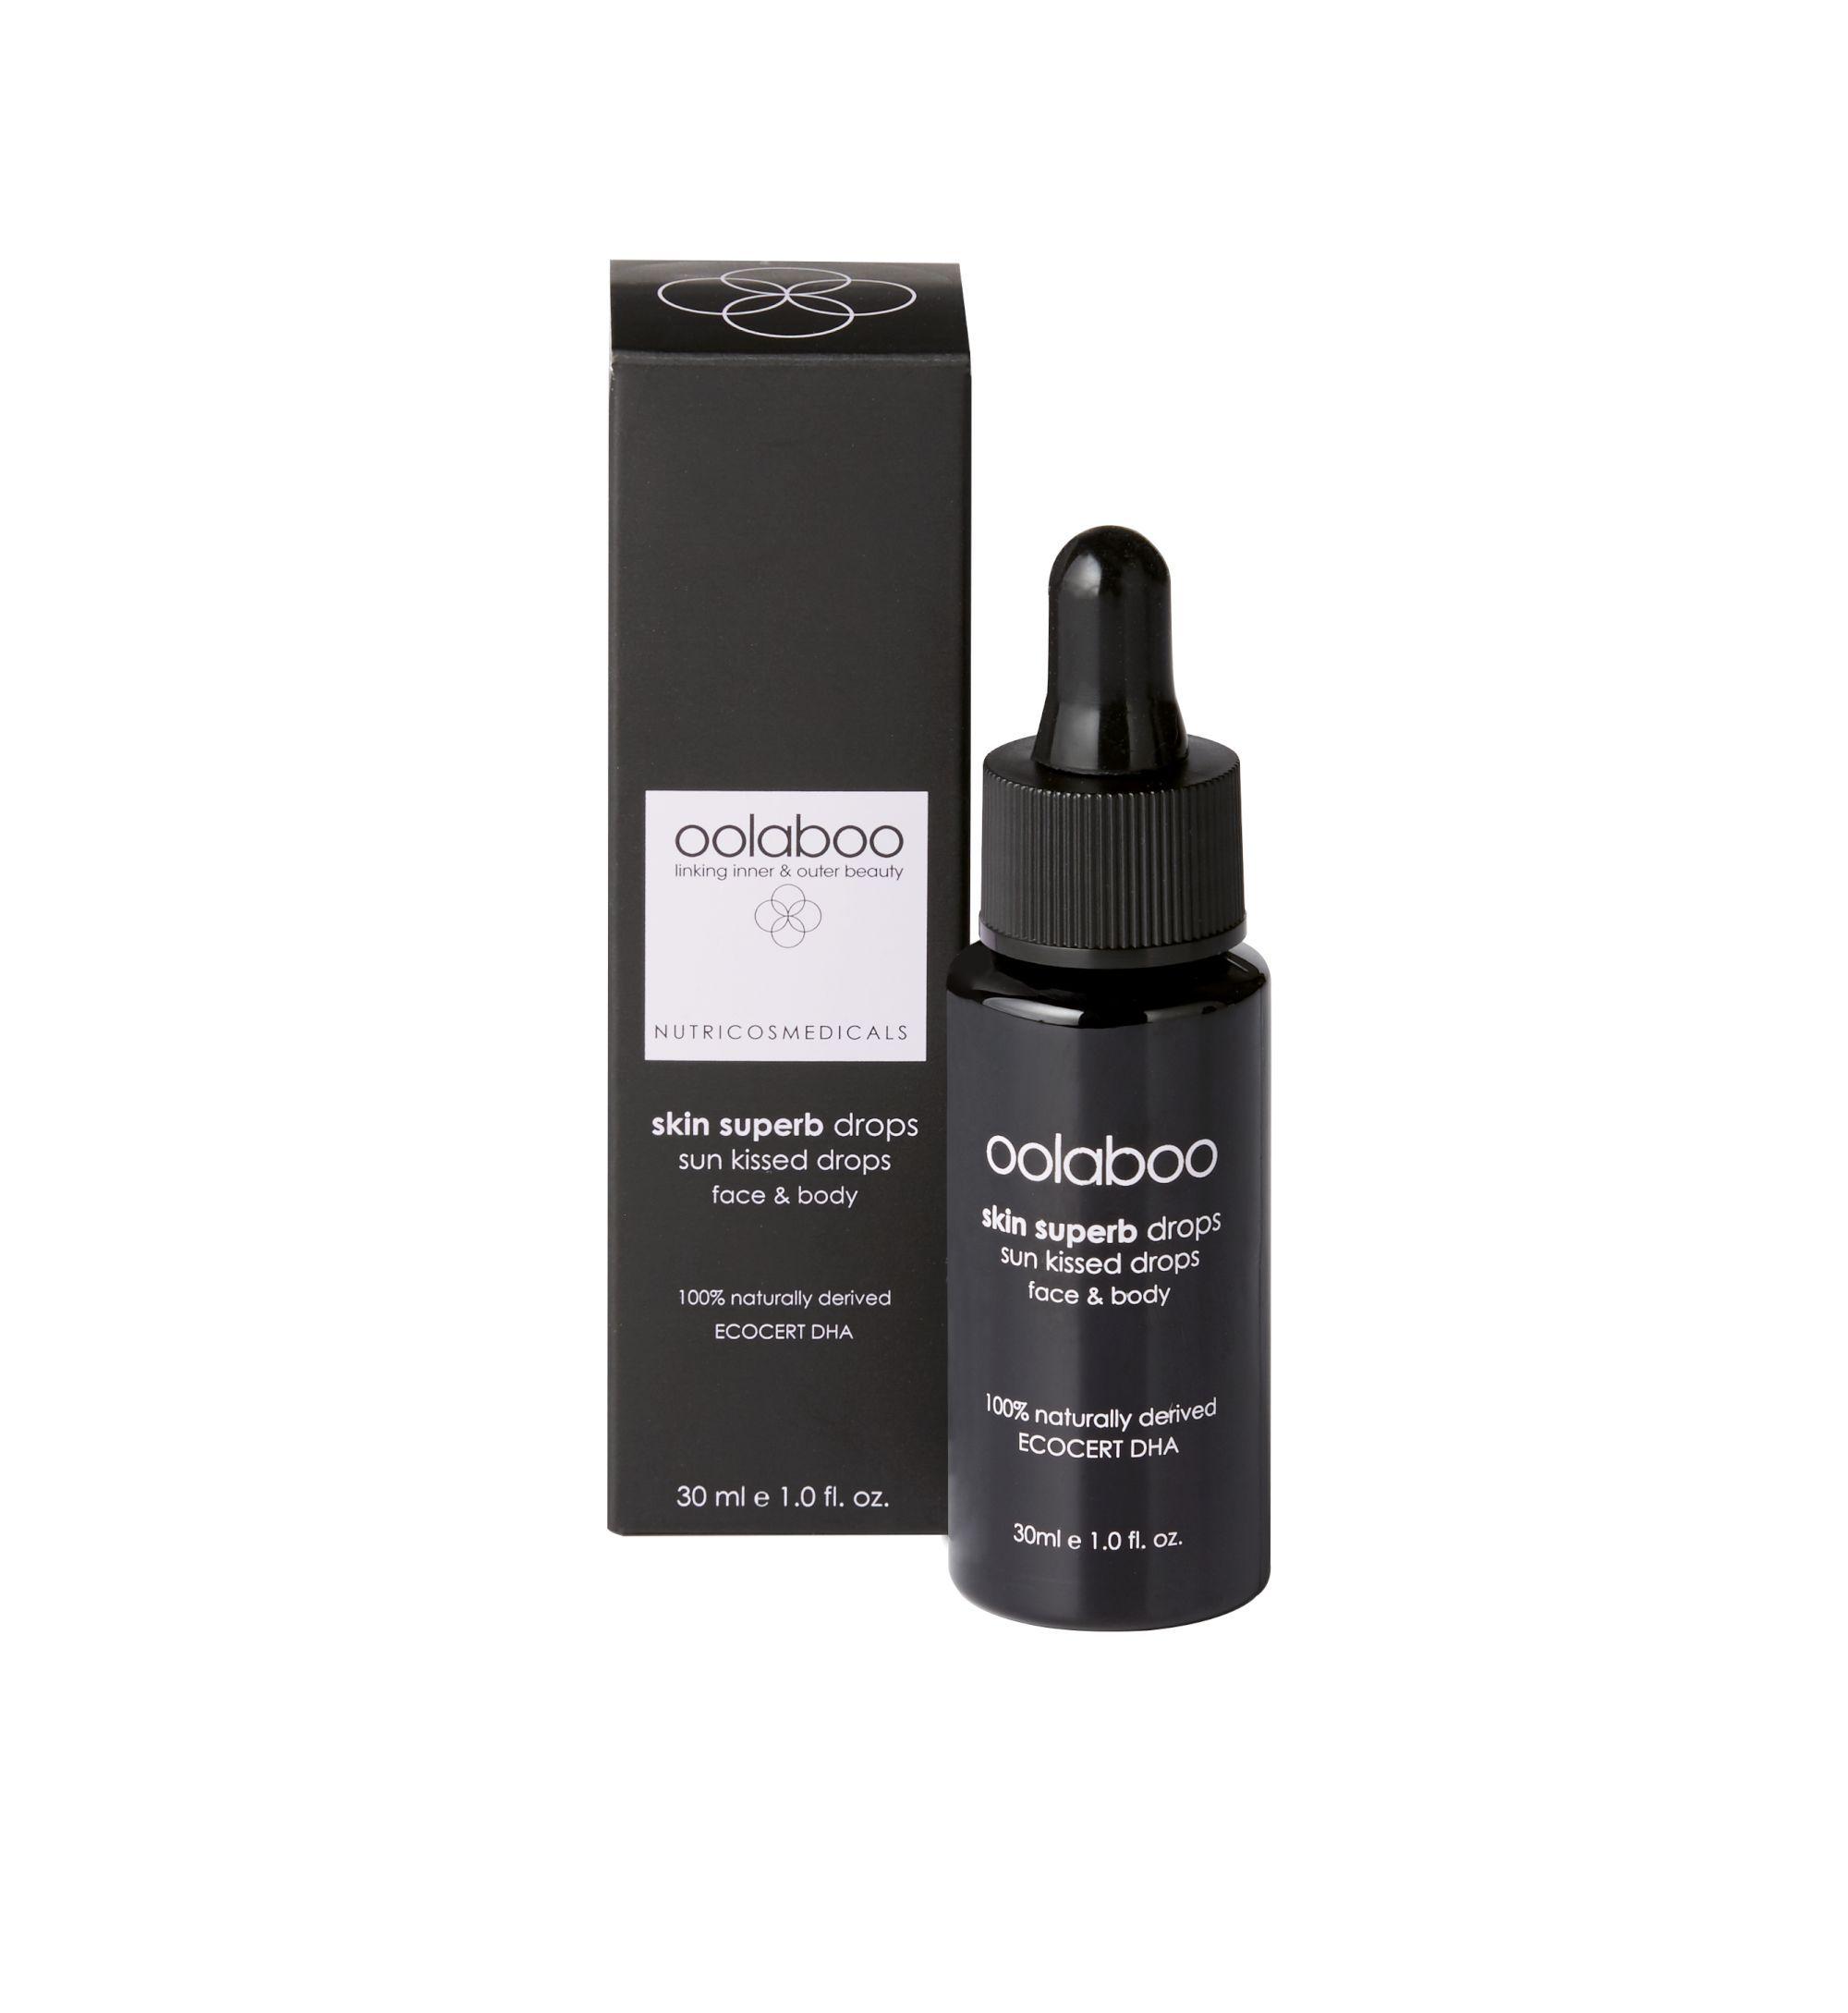 Oolaboo skin superb sun kissed drops 30 ml